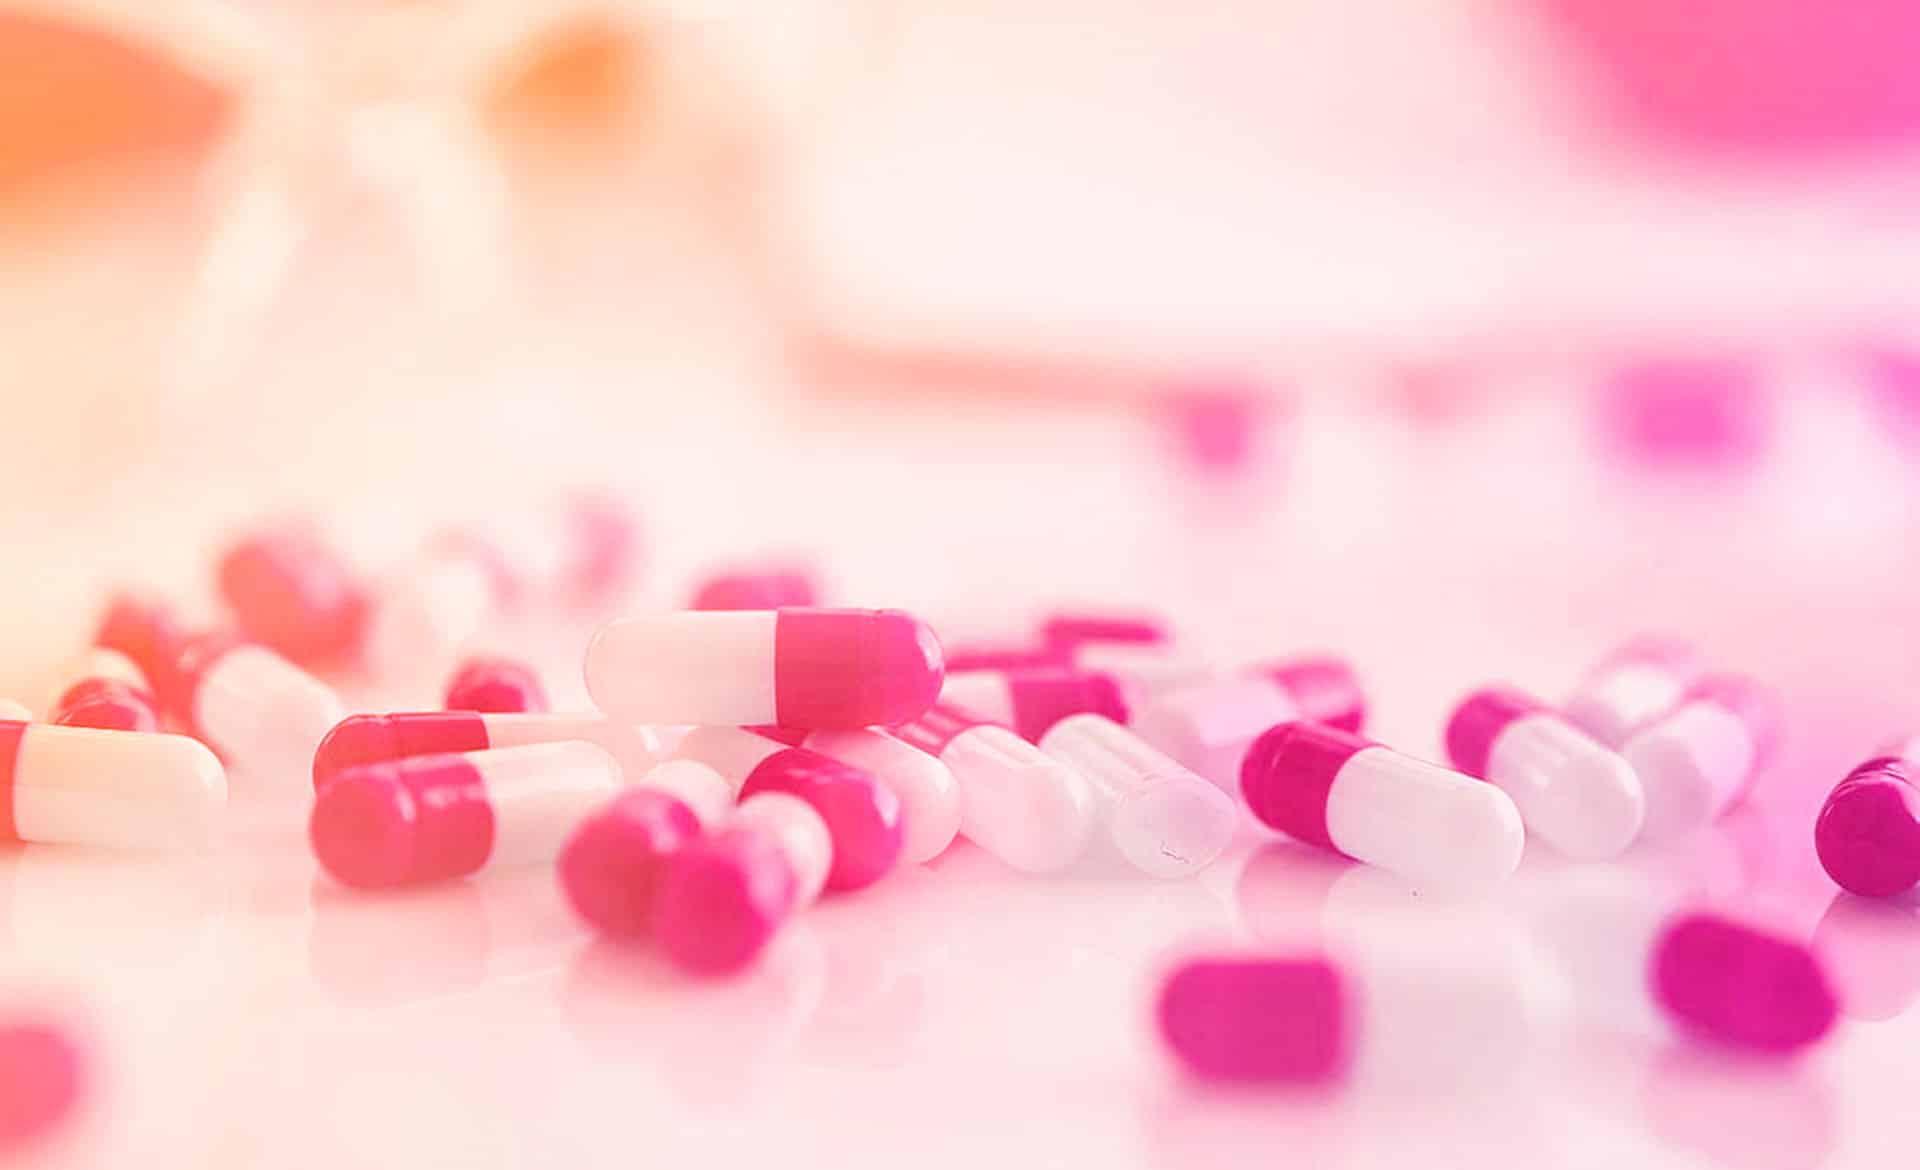 Terapia Endócrina – Hormonioterapia